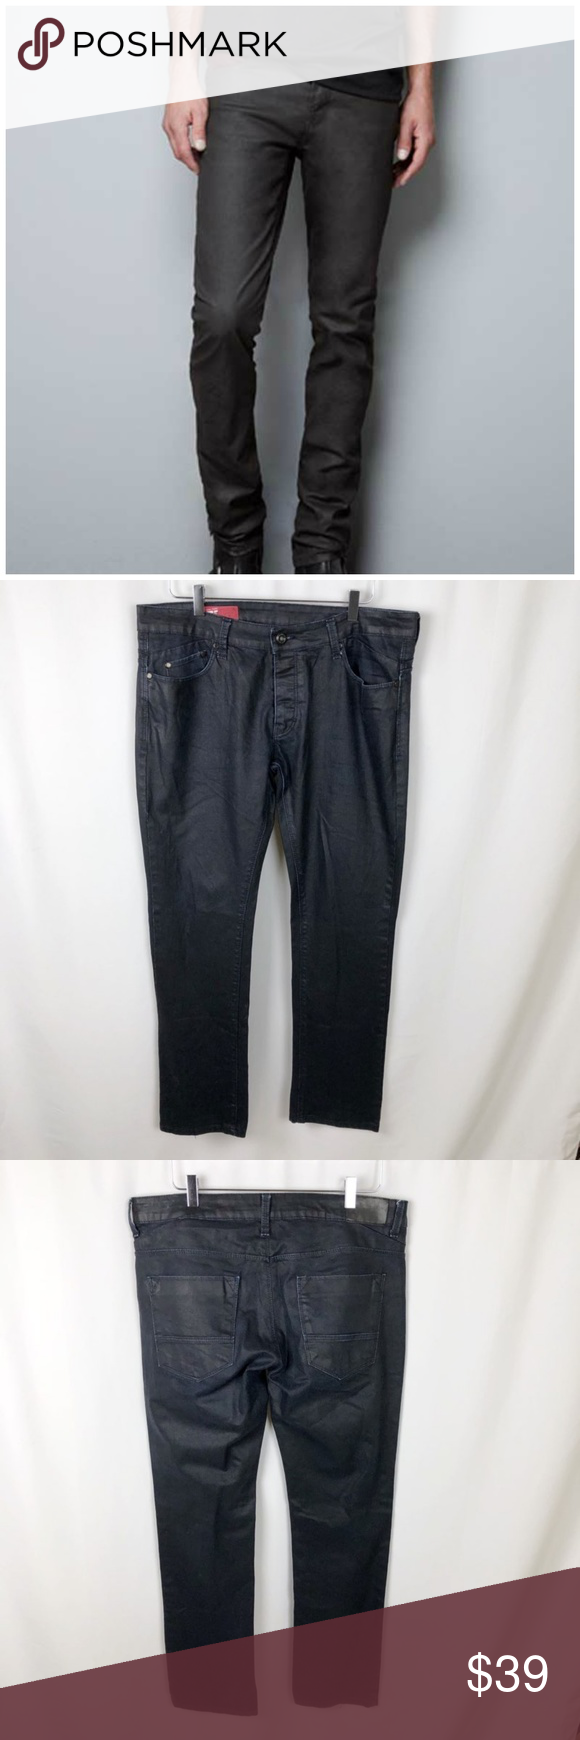 07c99d48 Zara Men's Black Waxed Jeans Zara Men's Black Waxed Jeans 36 Black with  waxed appearance A little fading 5 pocket, zipper, and button closure  Overall length ...